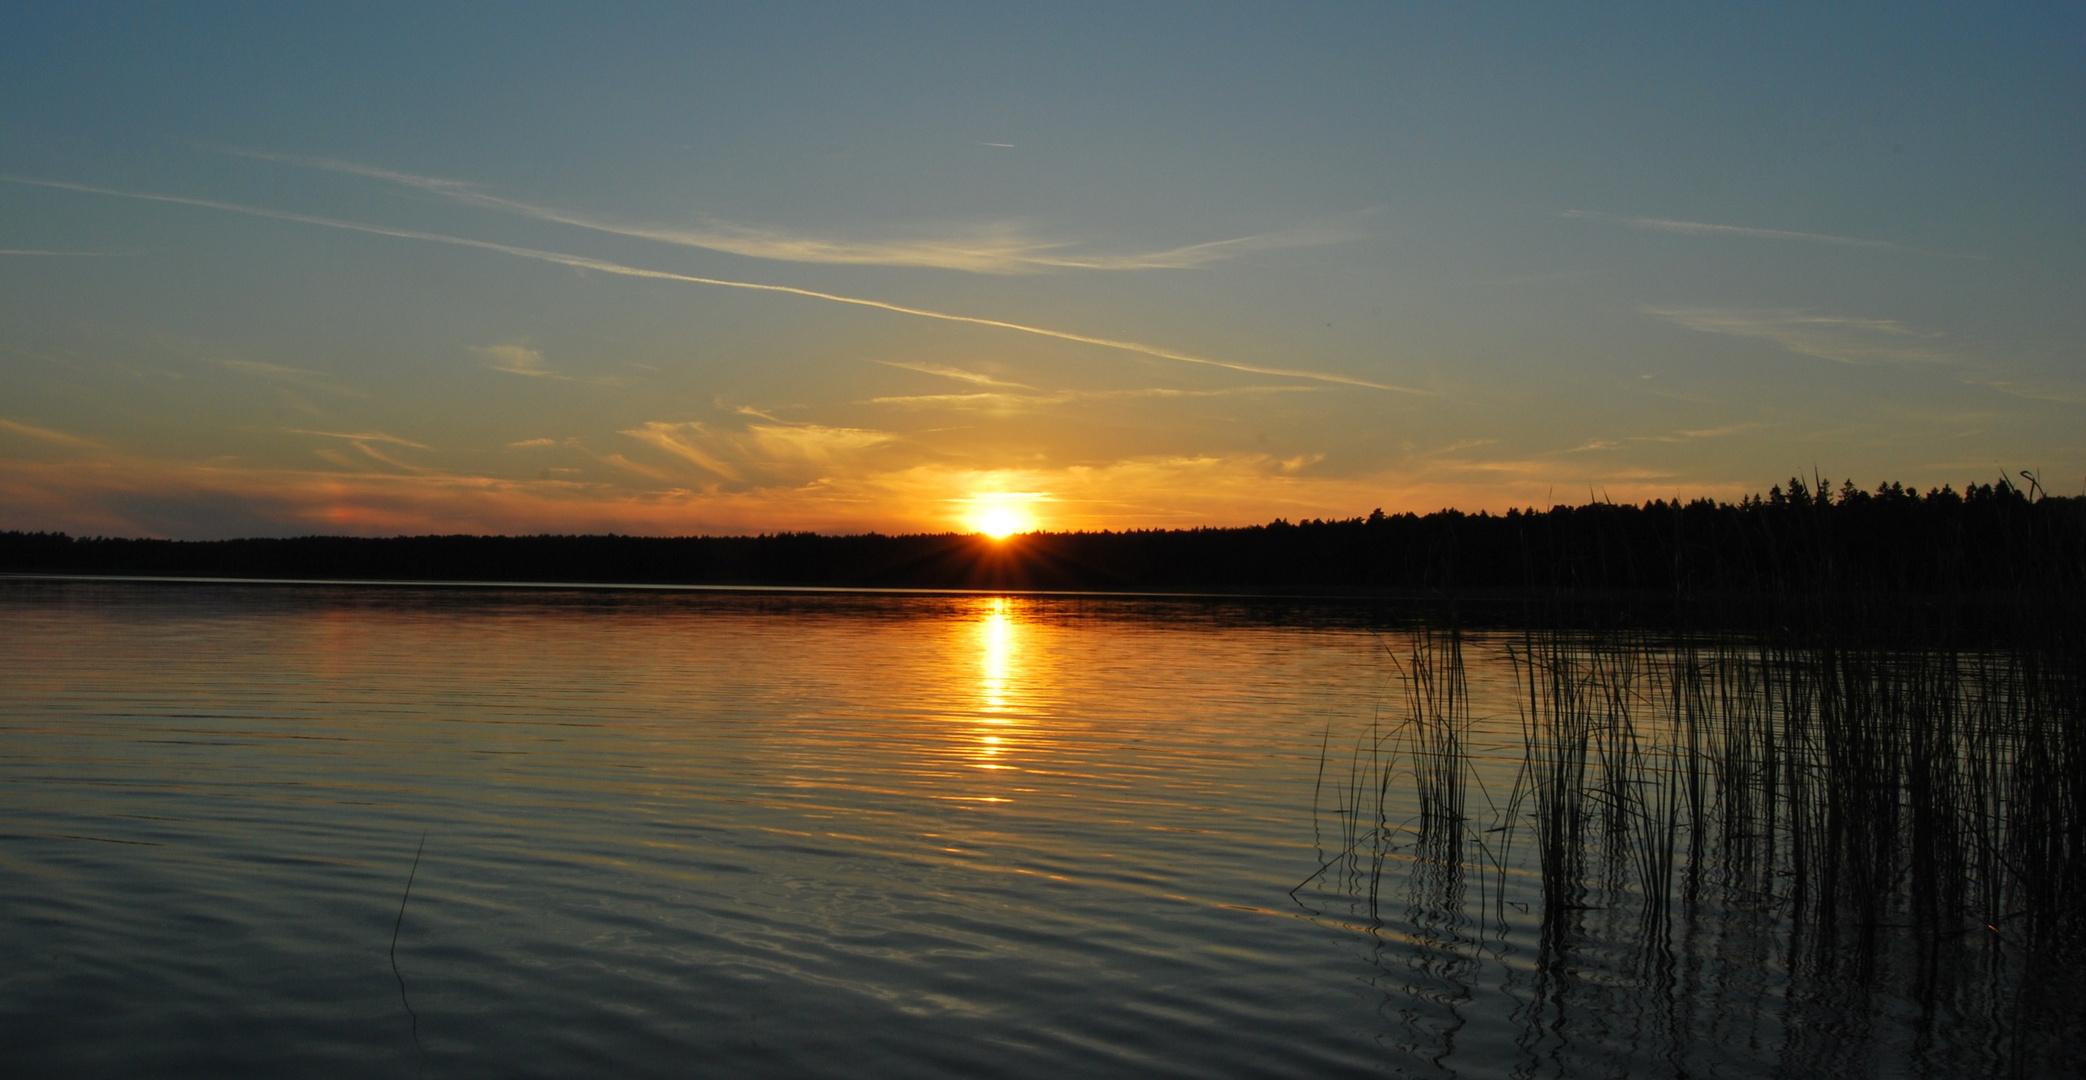 """ Sonnenuntergang am See"""